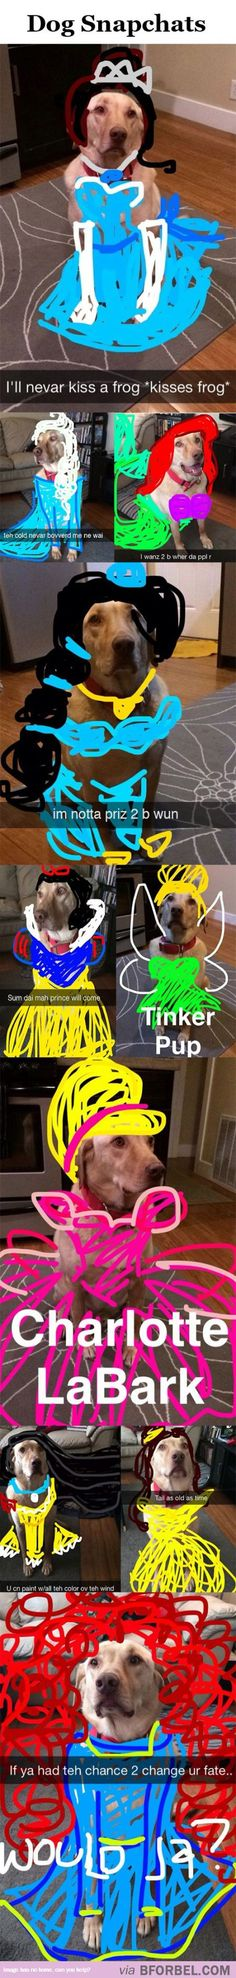 10 Snapchats That Turned This Dog Into A Disney Princess